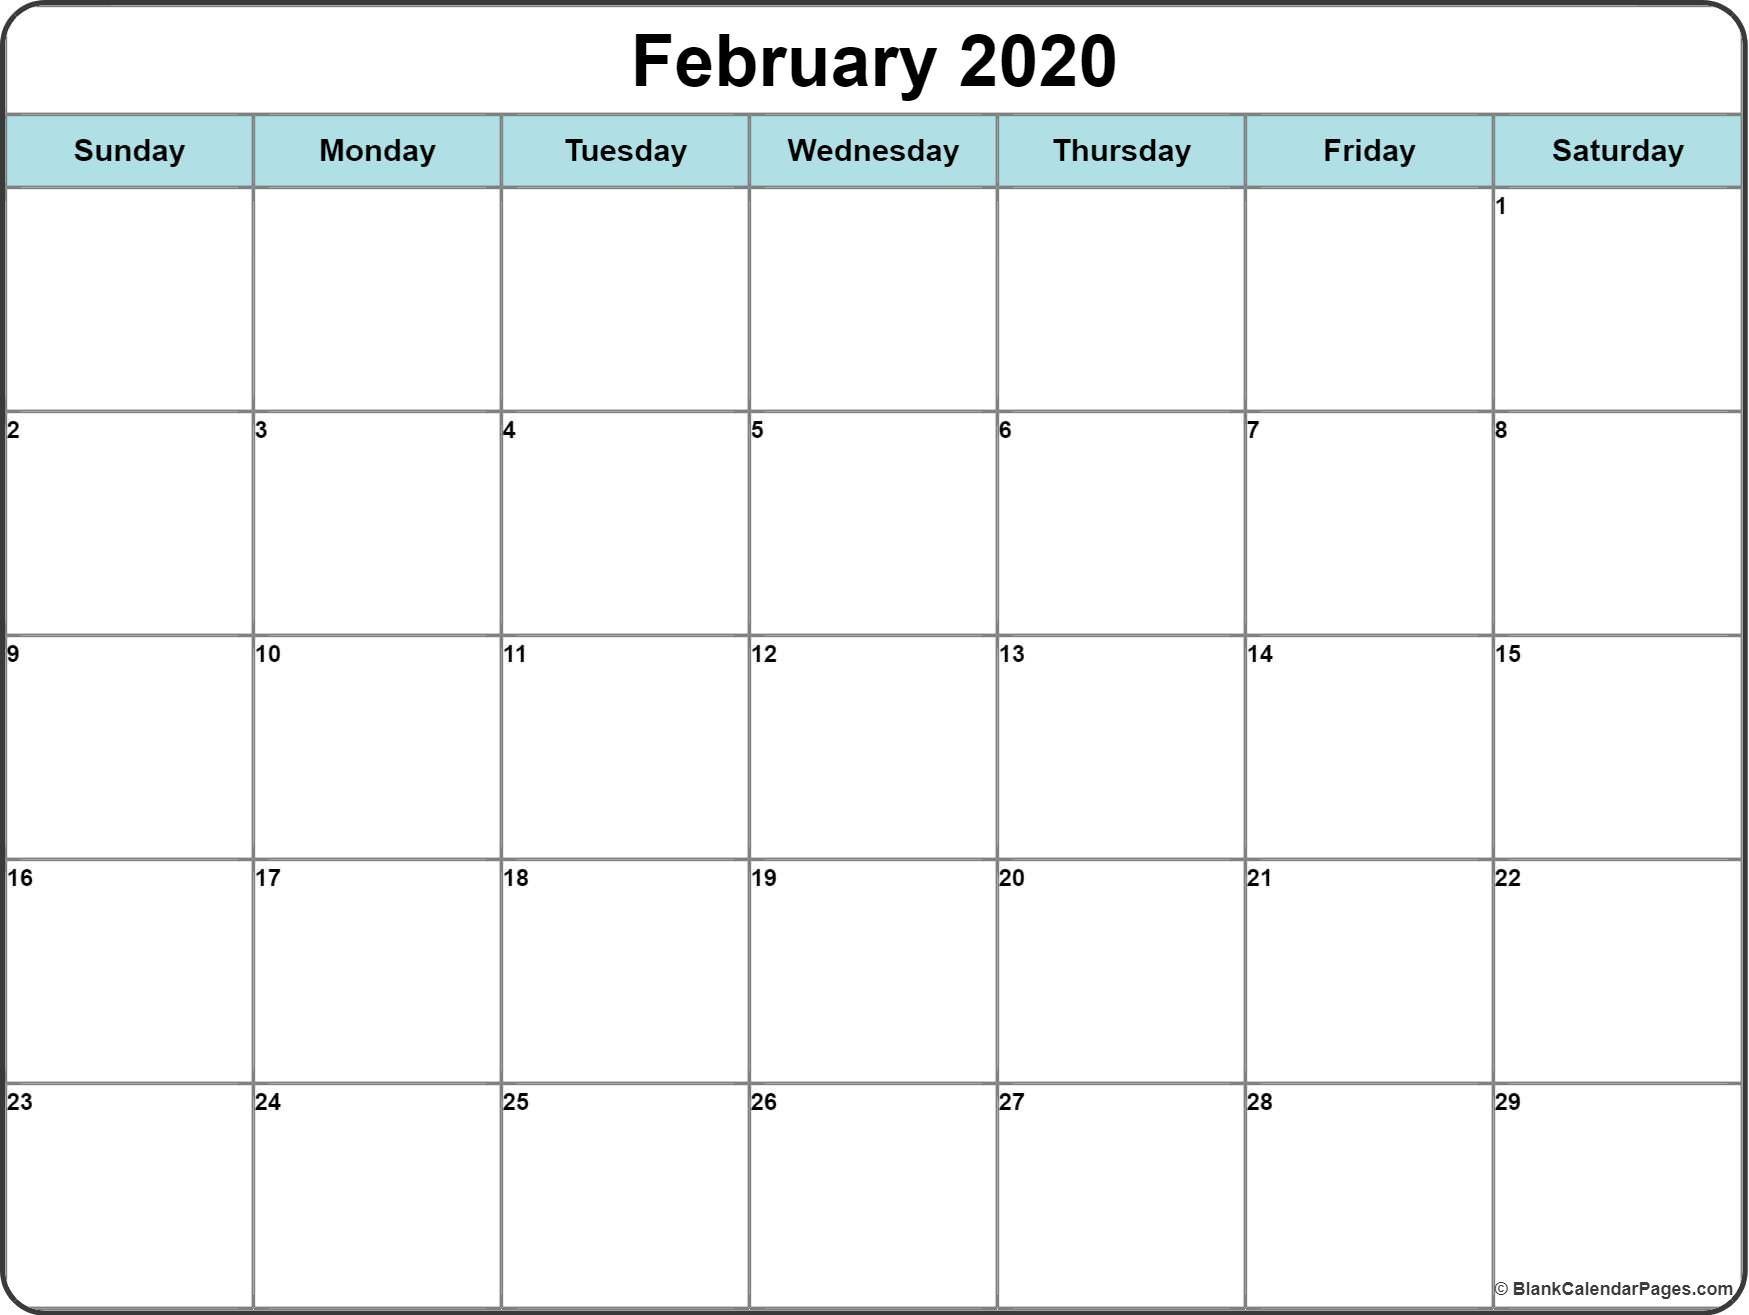 February 2020 Printable Calendar Template 2020calendars 2020printablecalendar 2020monthlycalendar Calendar Printables Calendar Word Free Printable Calendar